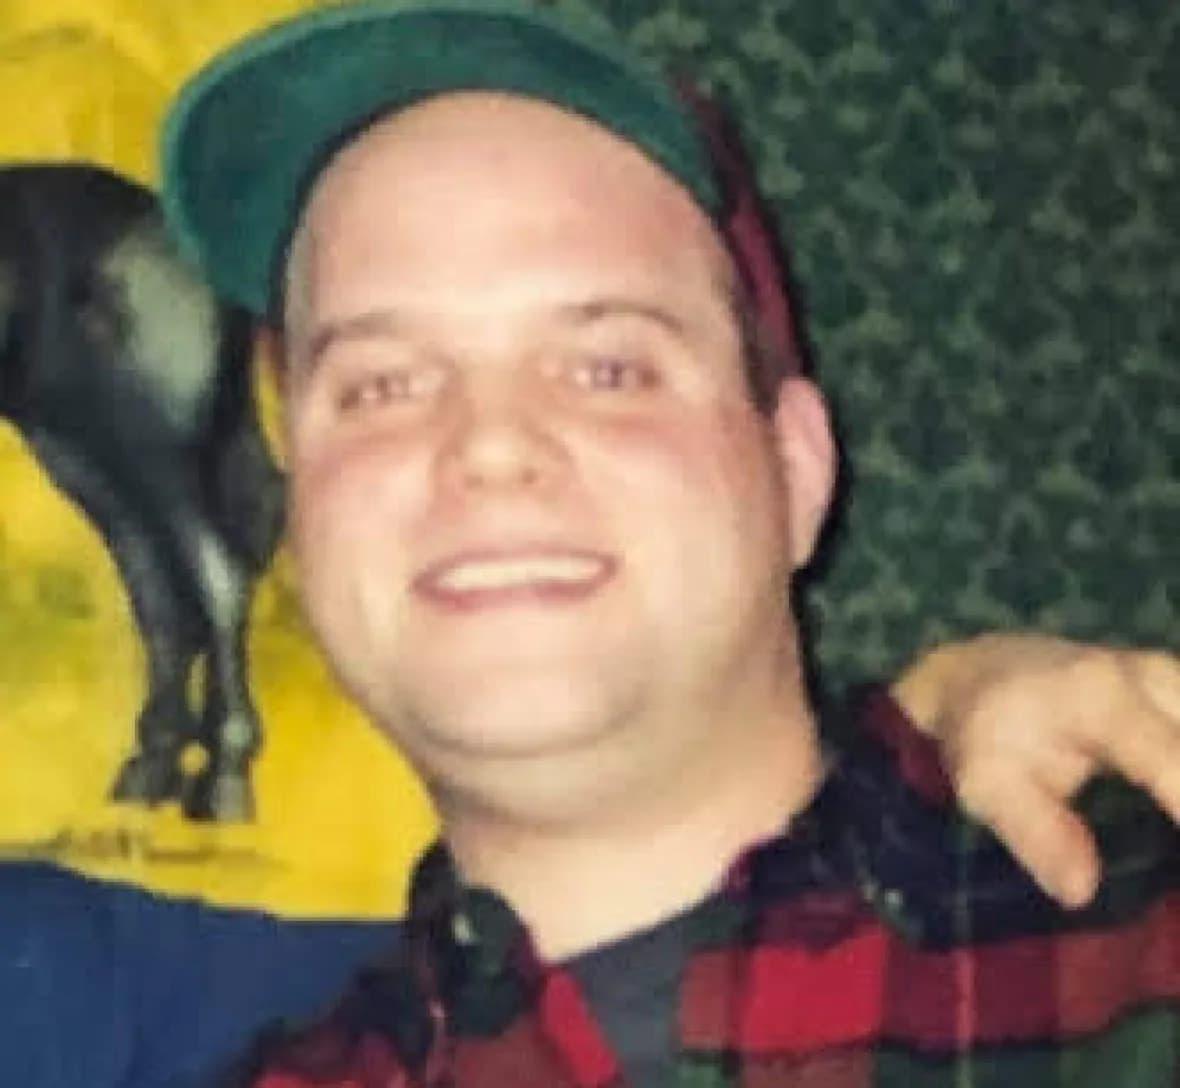 Mitch Lapa عامل تیراندازی پس از حادثه خودکشی کرد